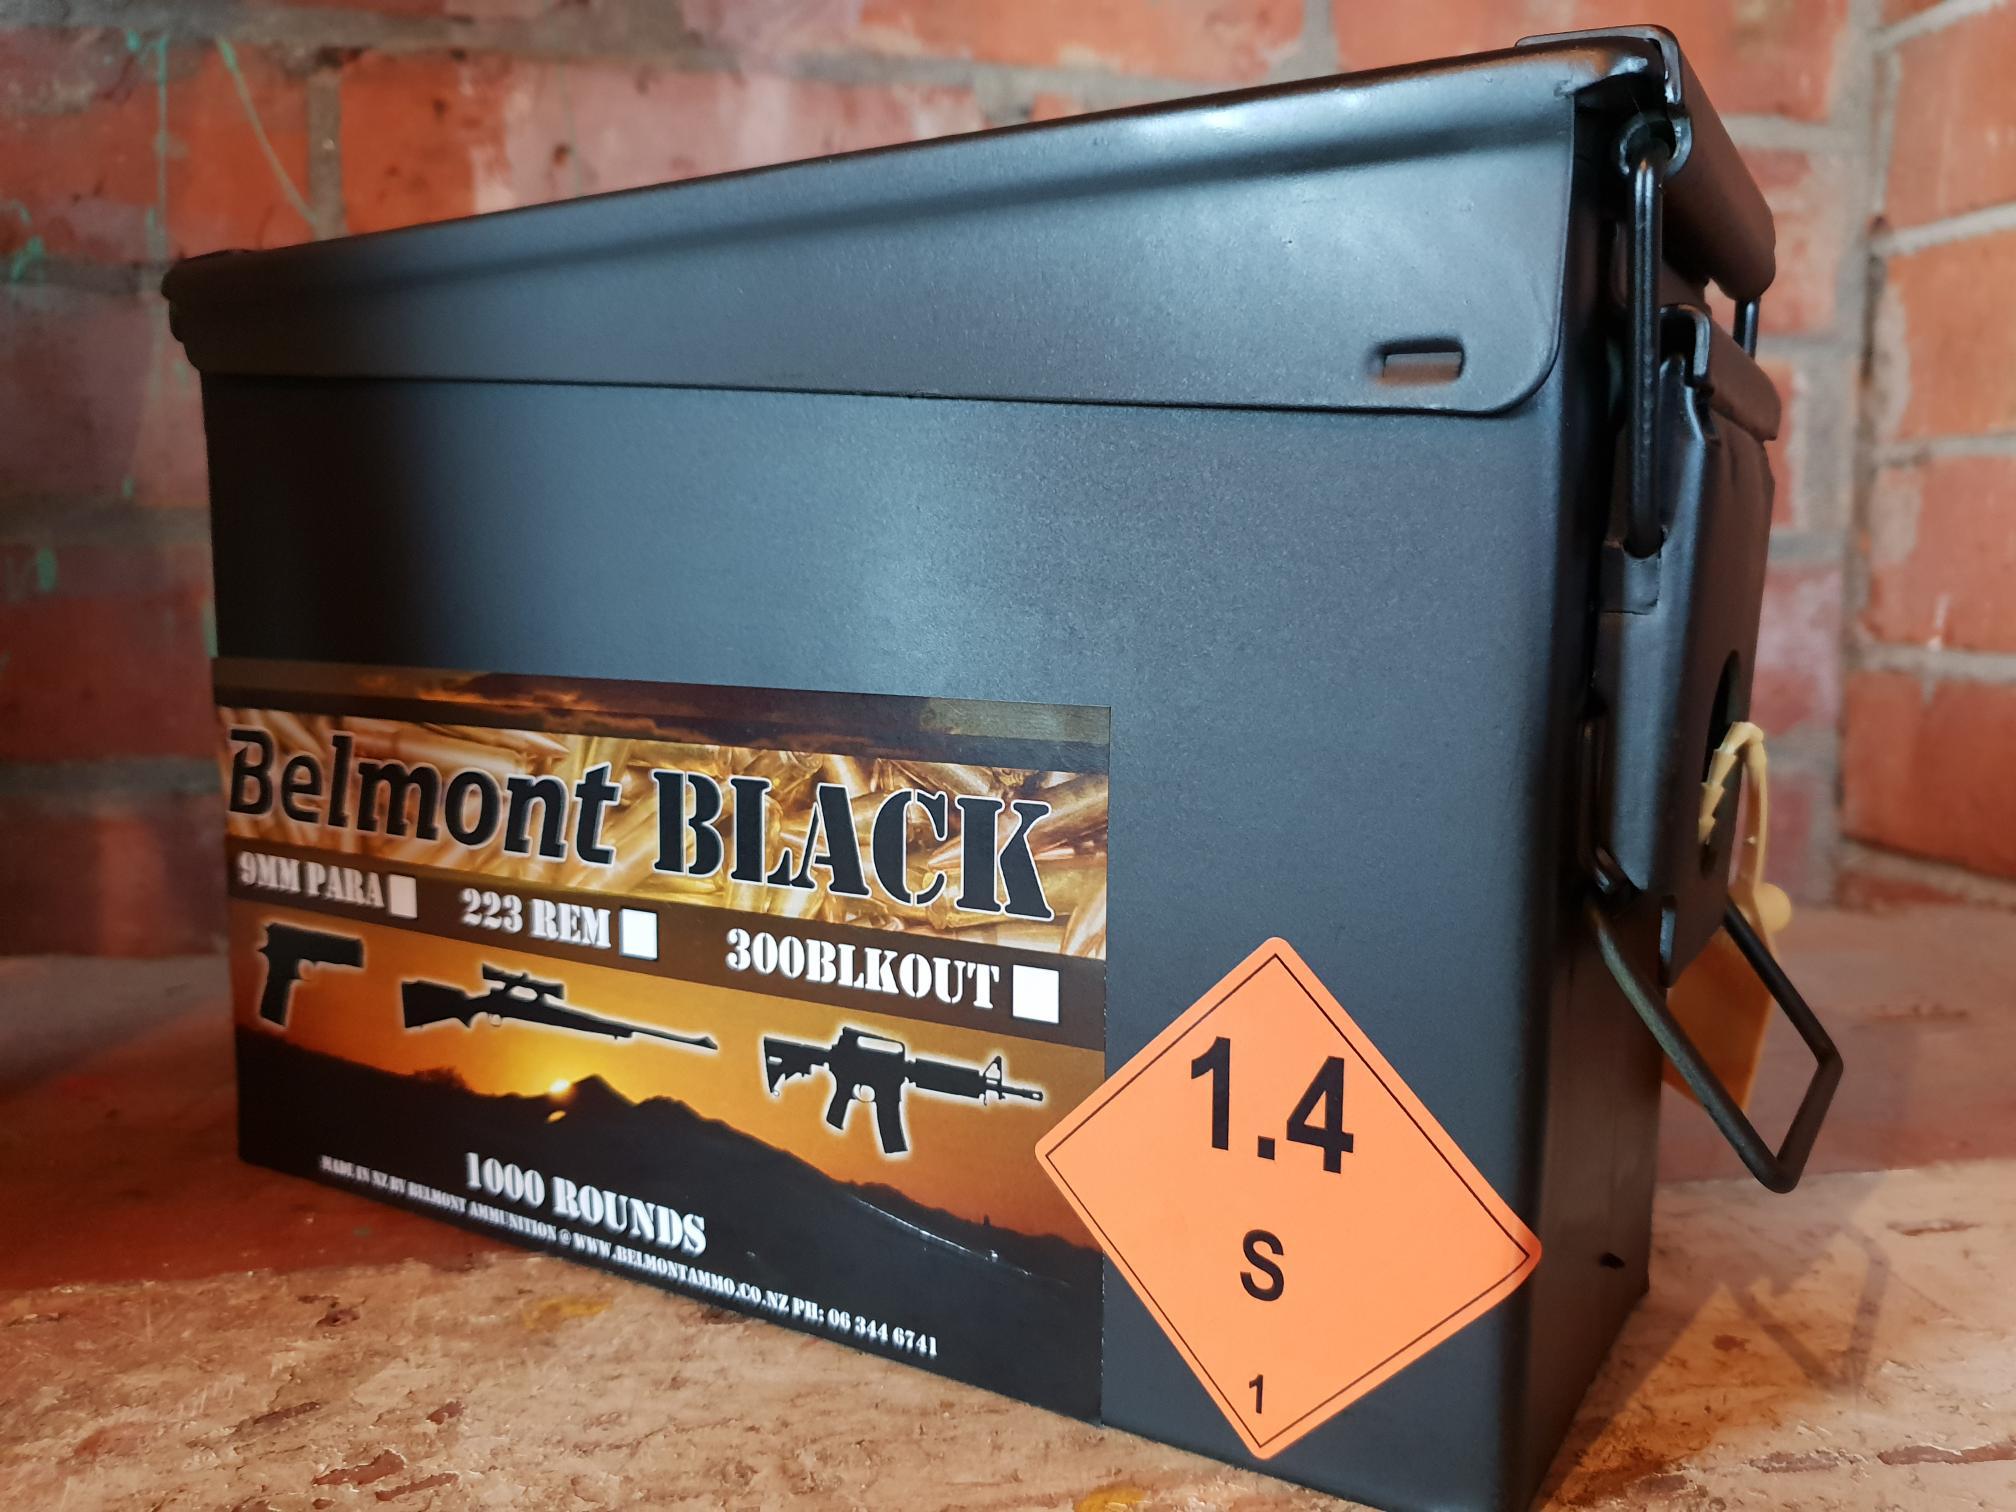 Belmont Black 9mm 147gr CMJ-FP OFC (1000 rounds)